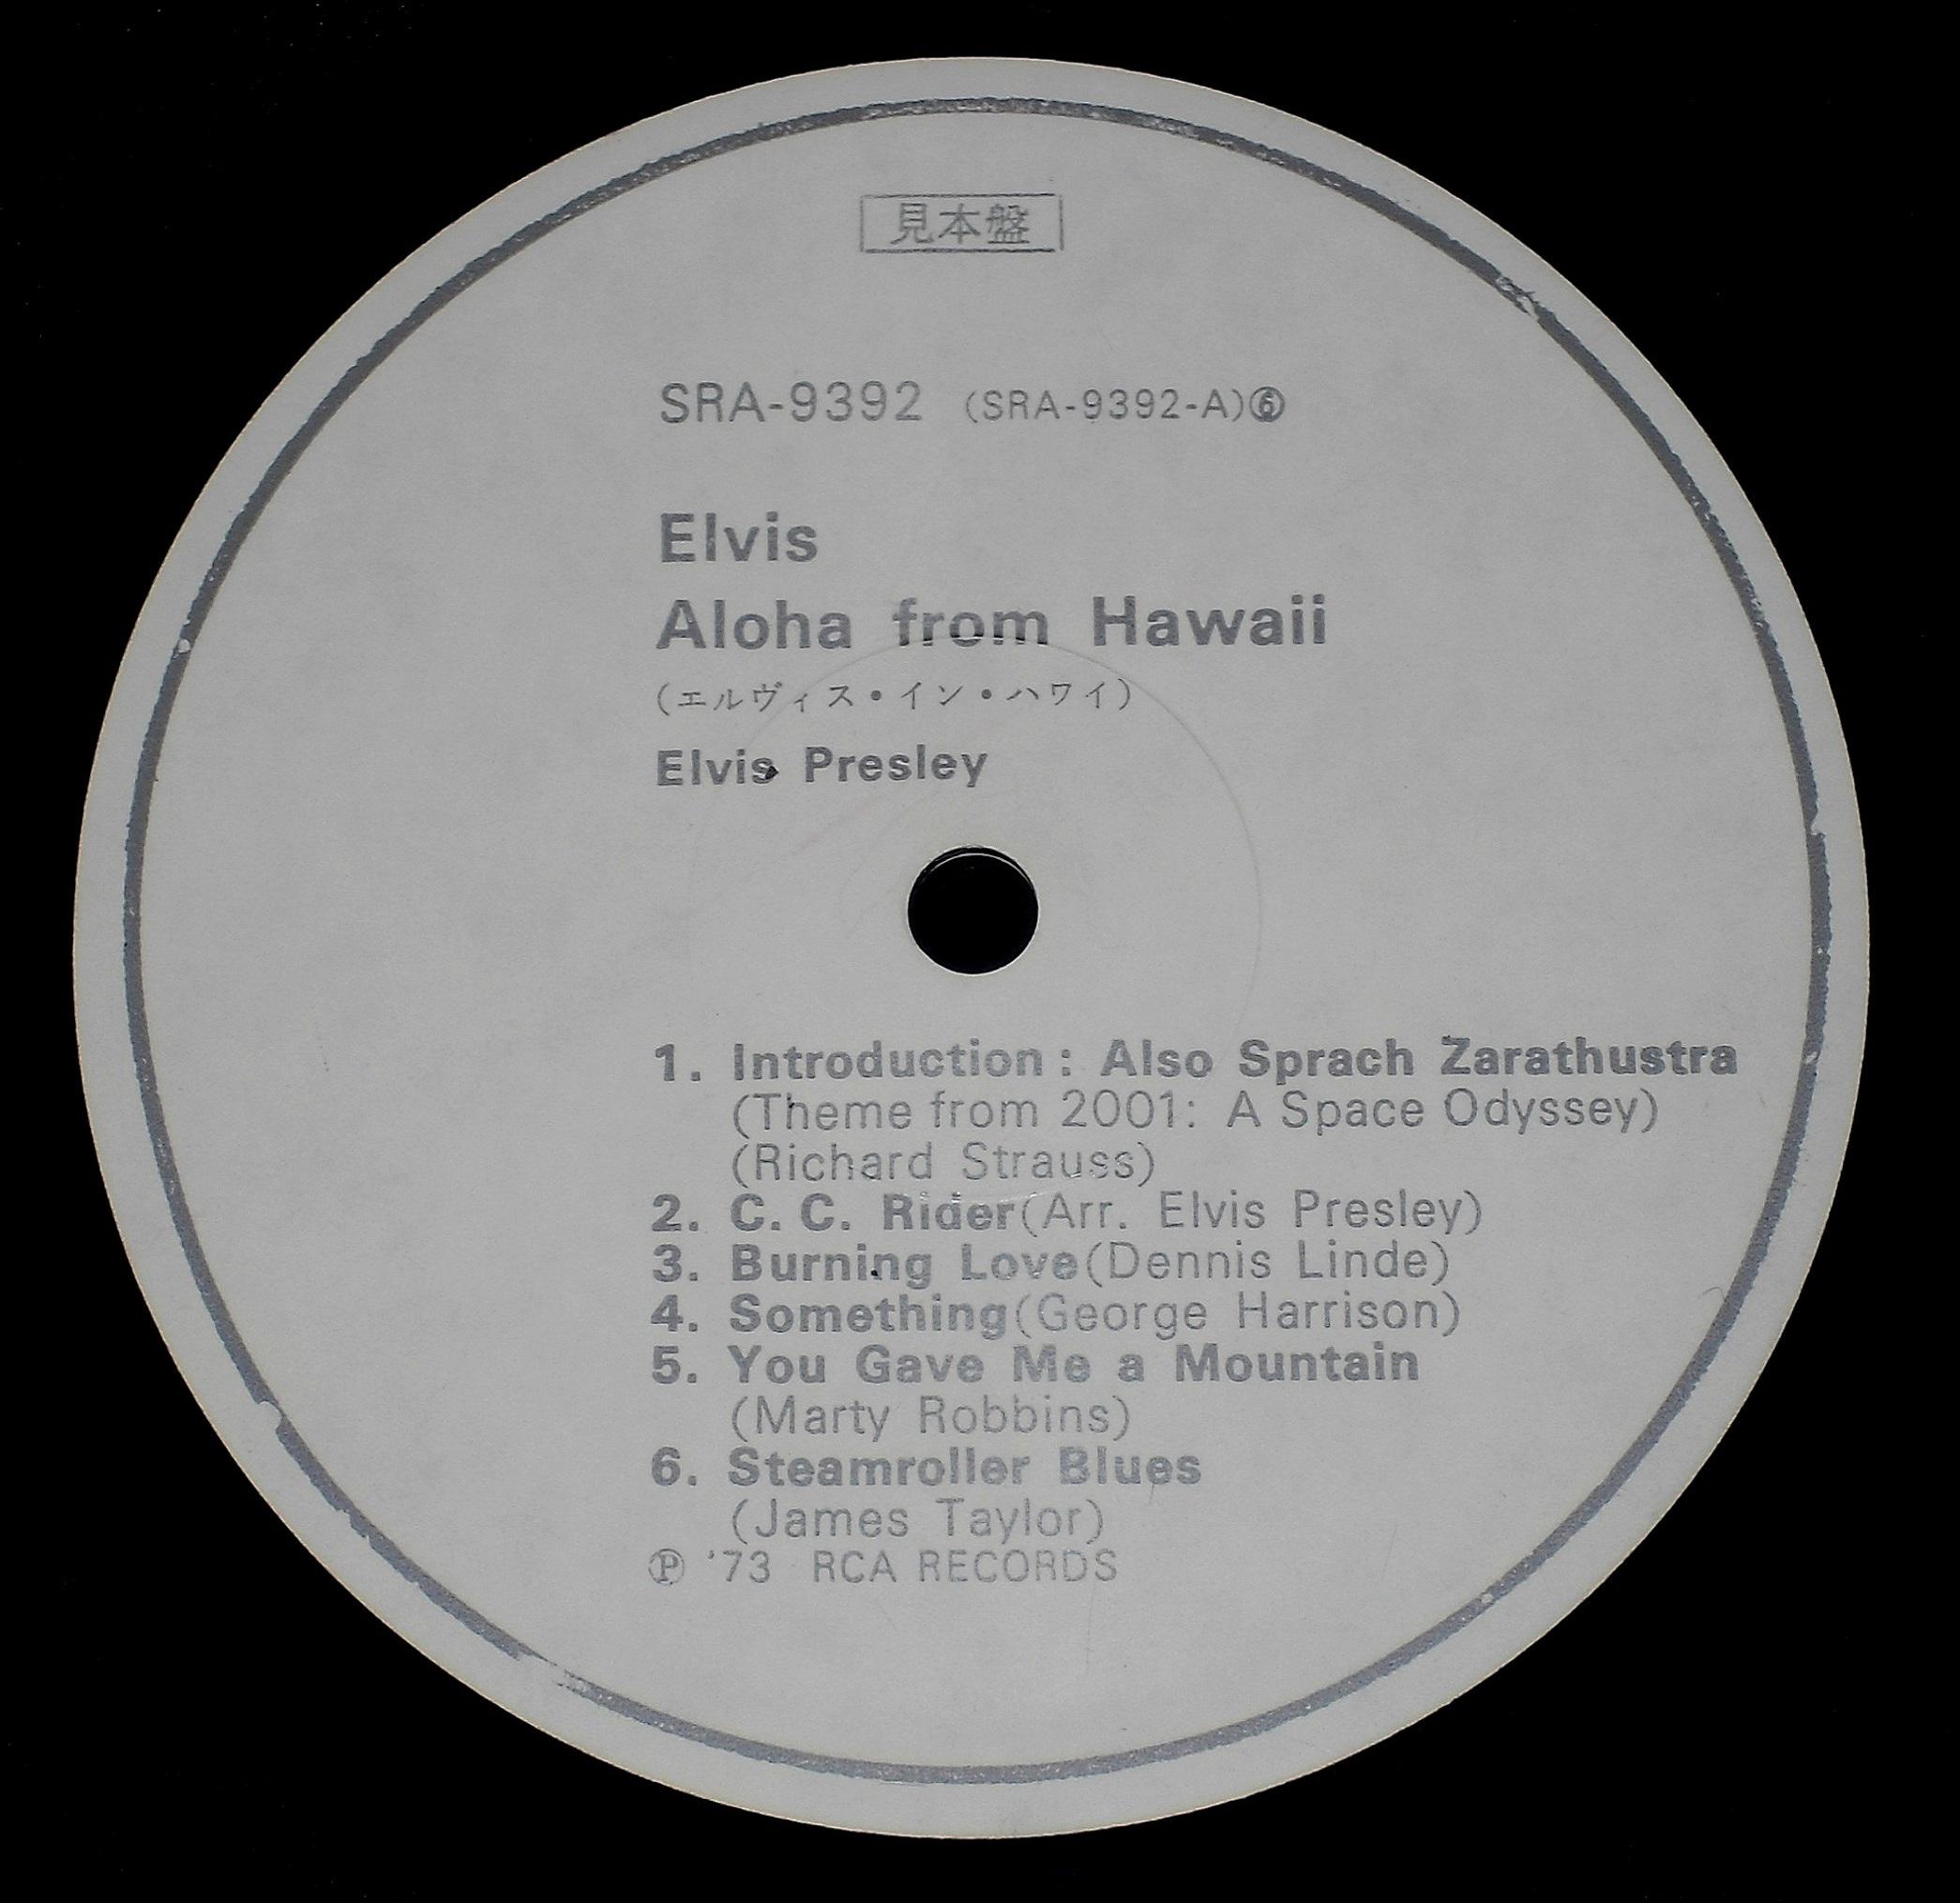 ALOHA FROM HAWAII VIA SATELLITE 04s1tuq8k